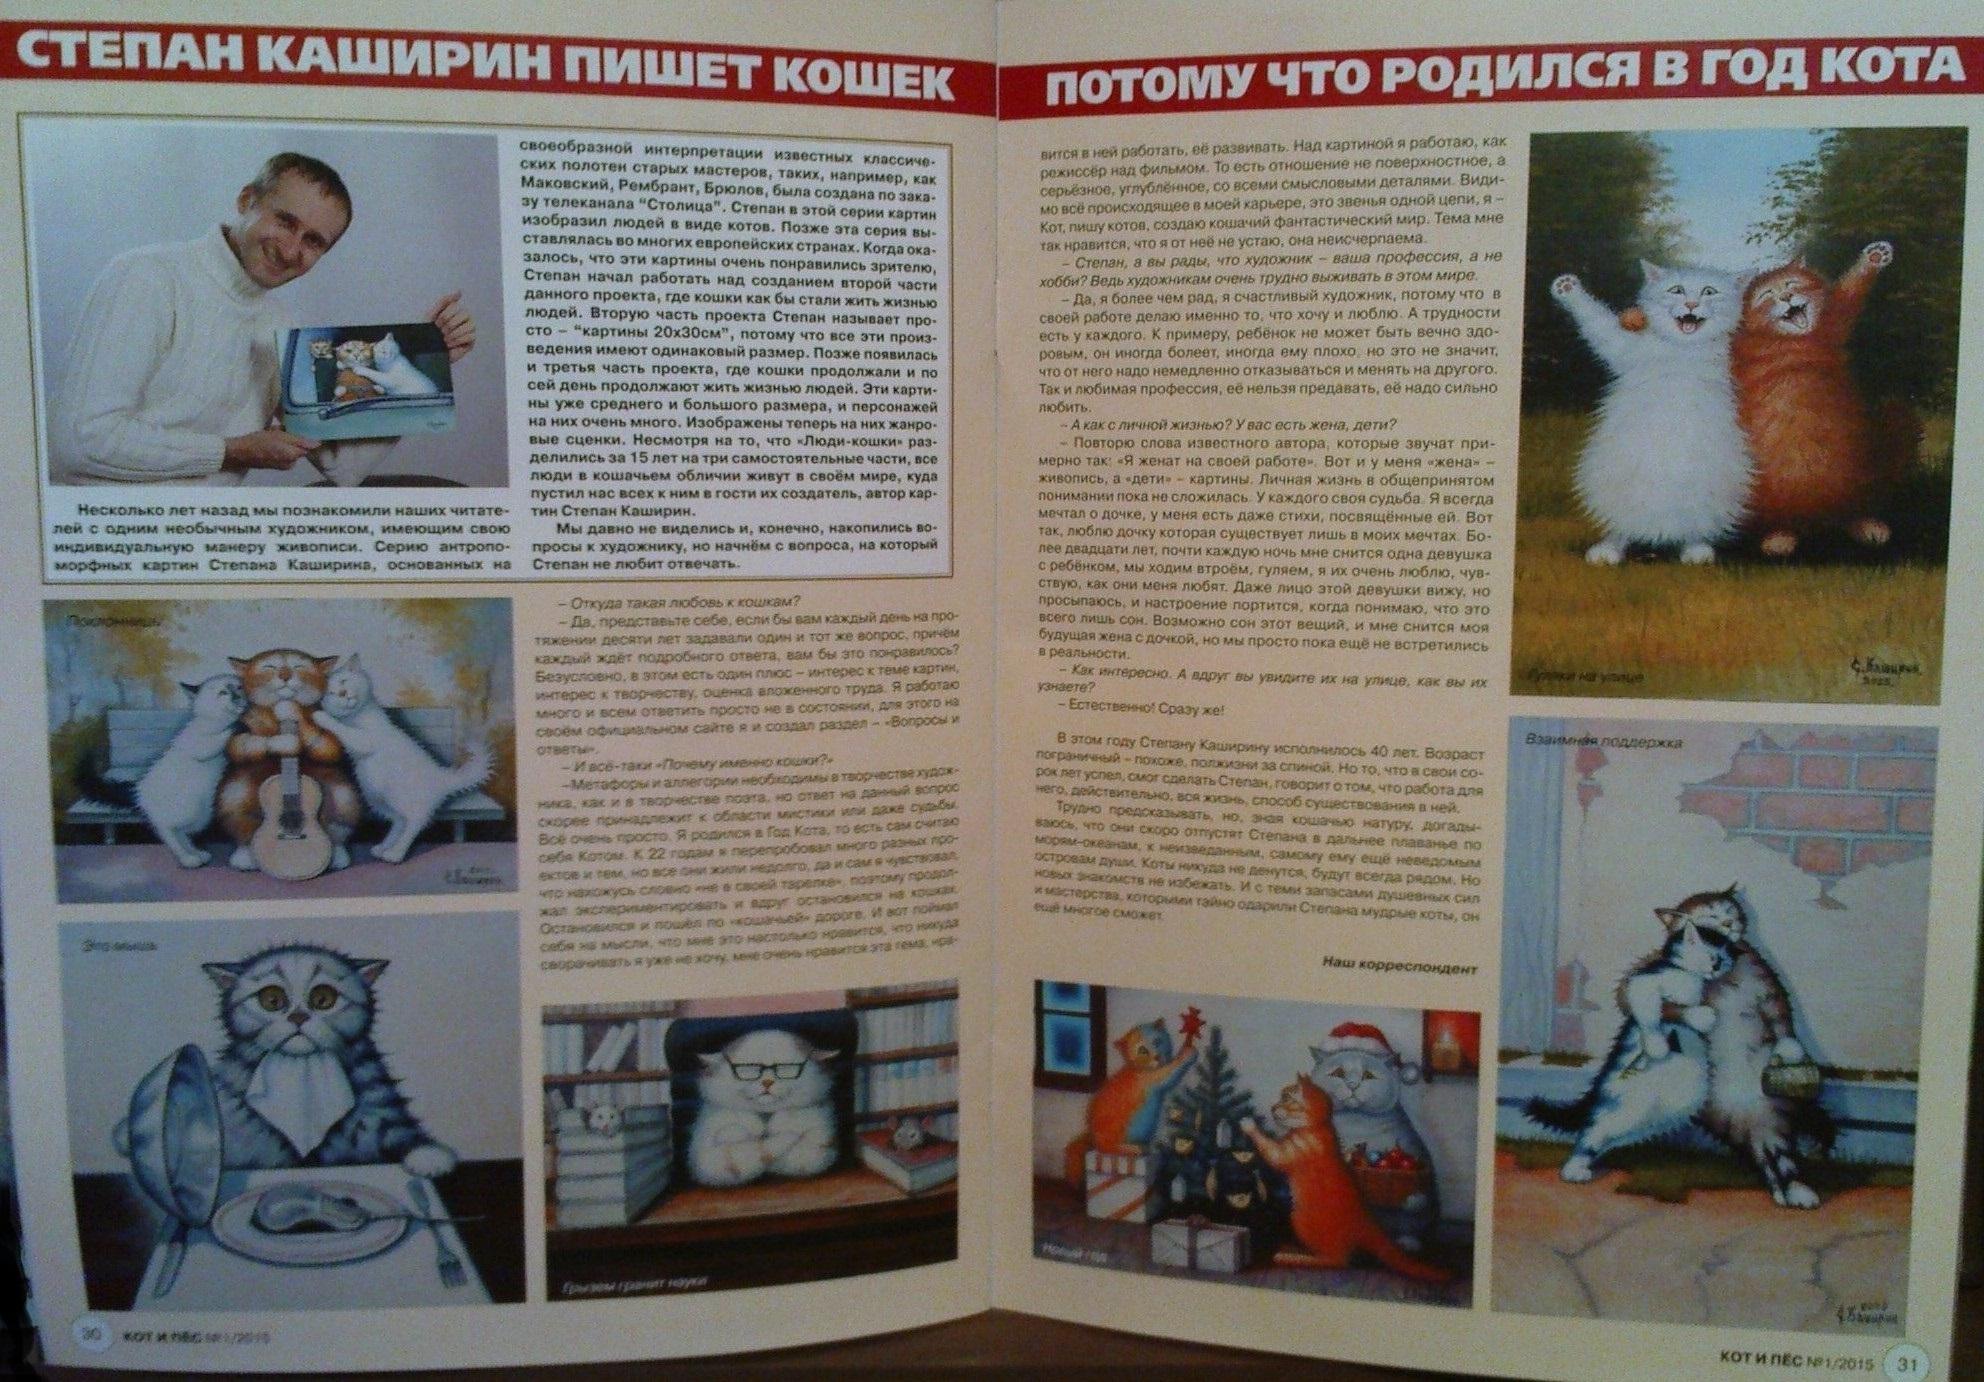 http://www.stepan-kashirin.ru/files/kot-i-pyos-2015.jpg